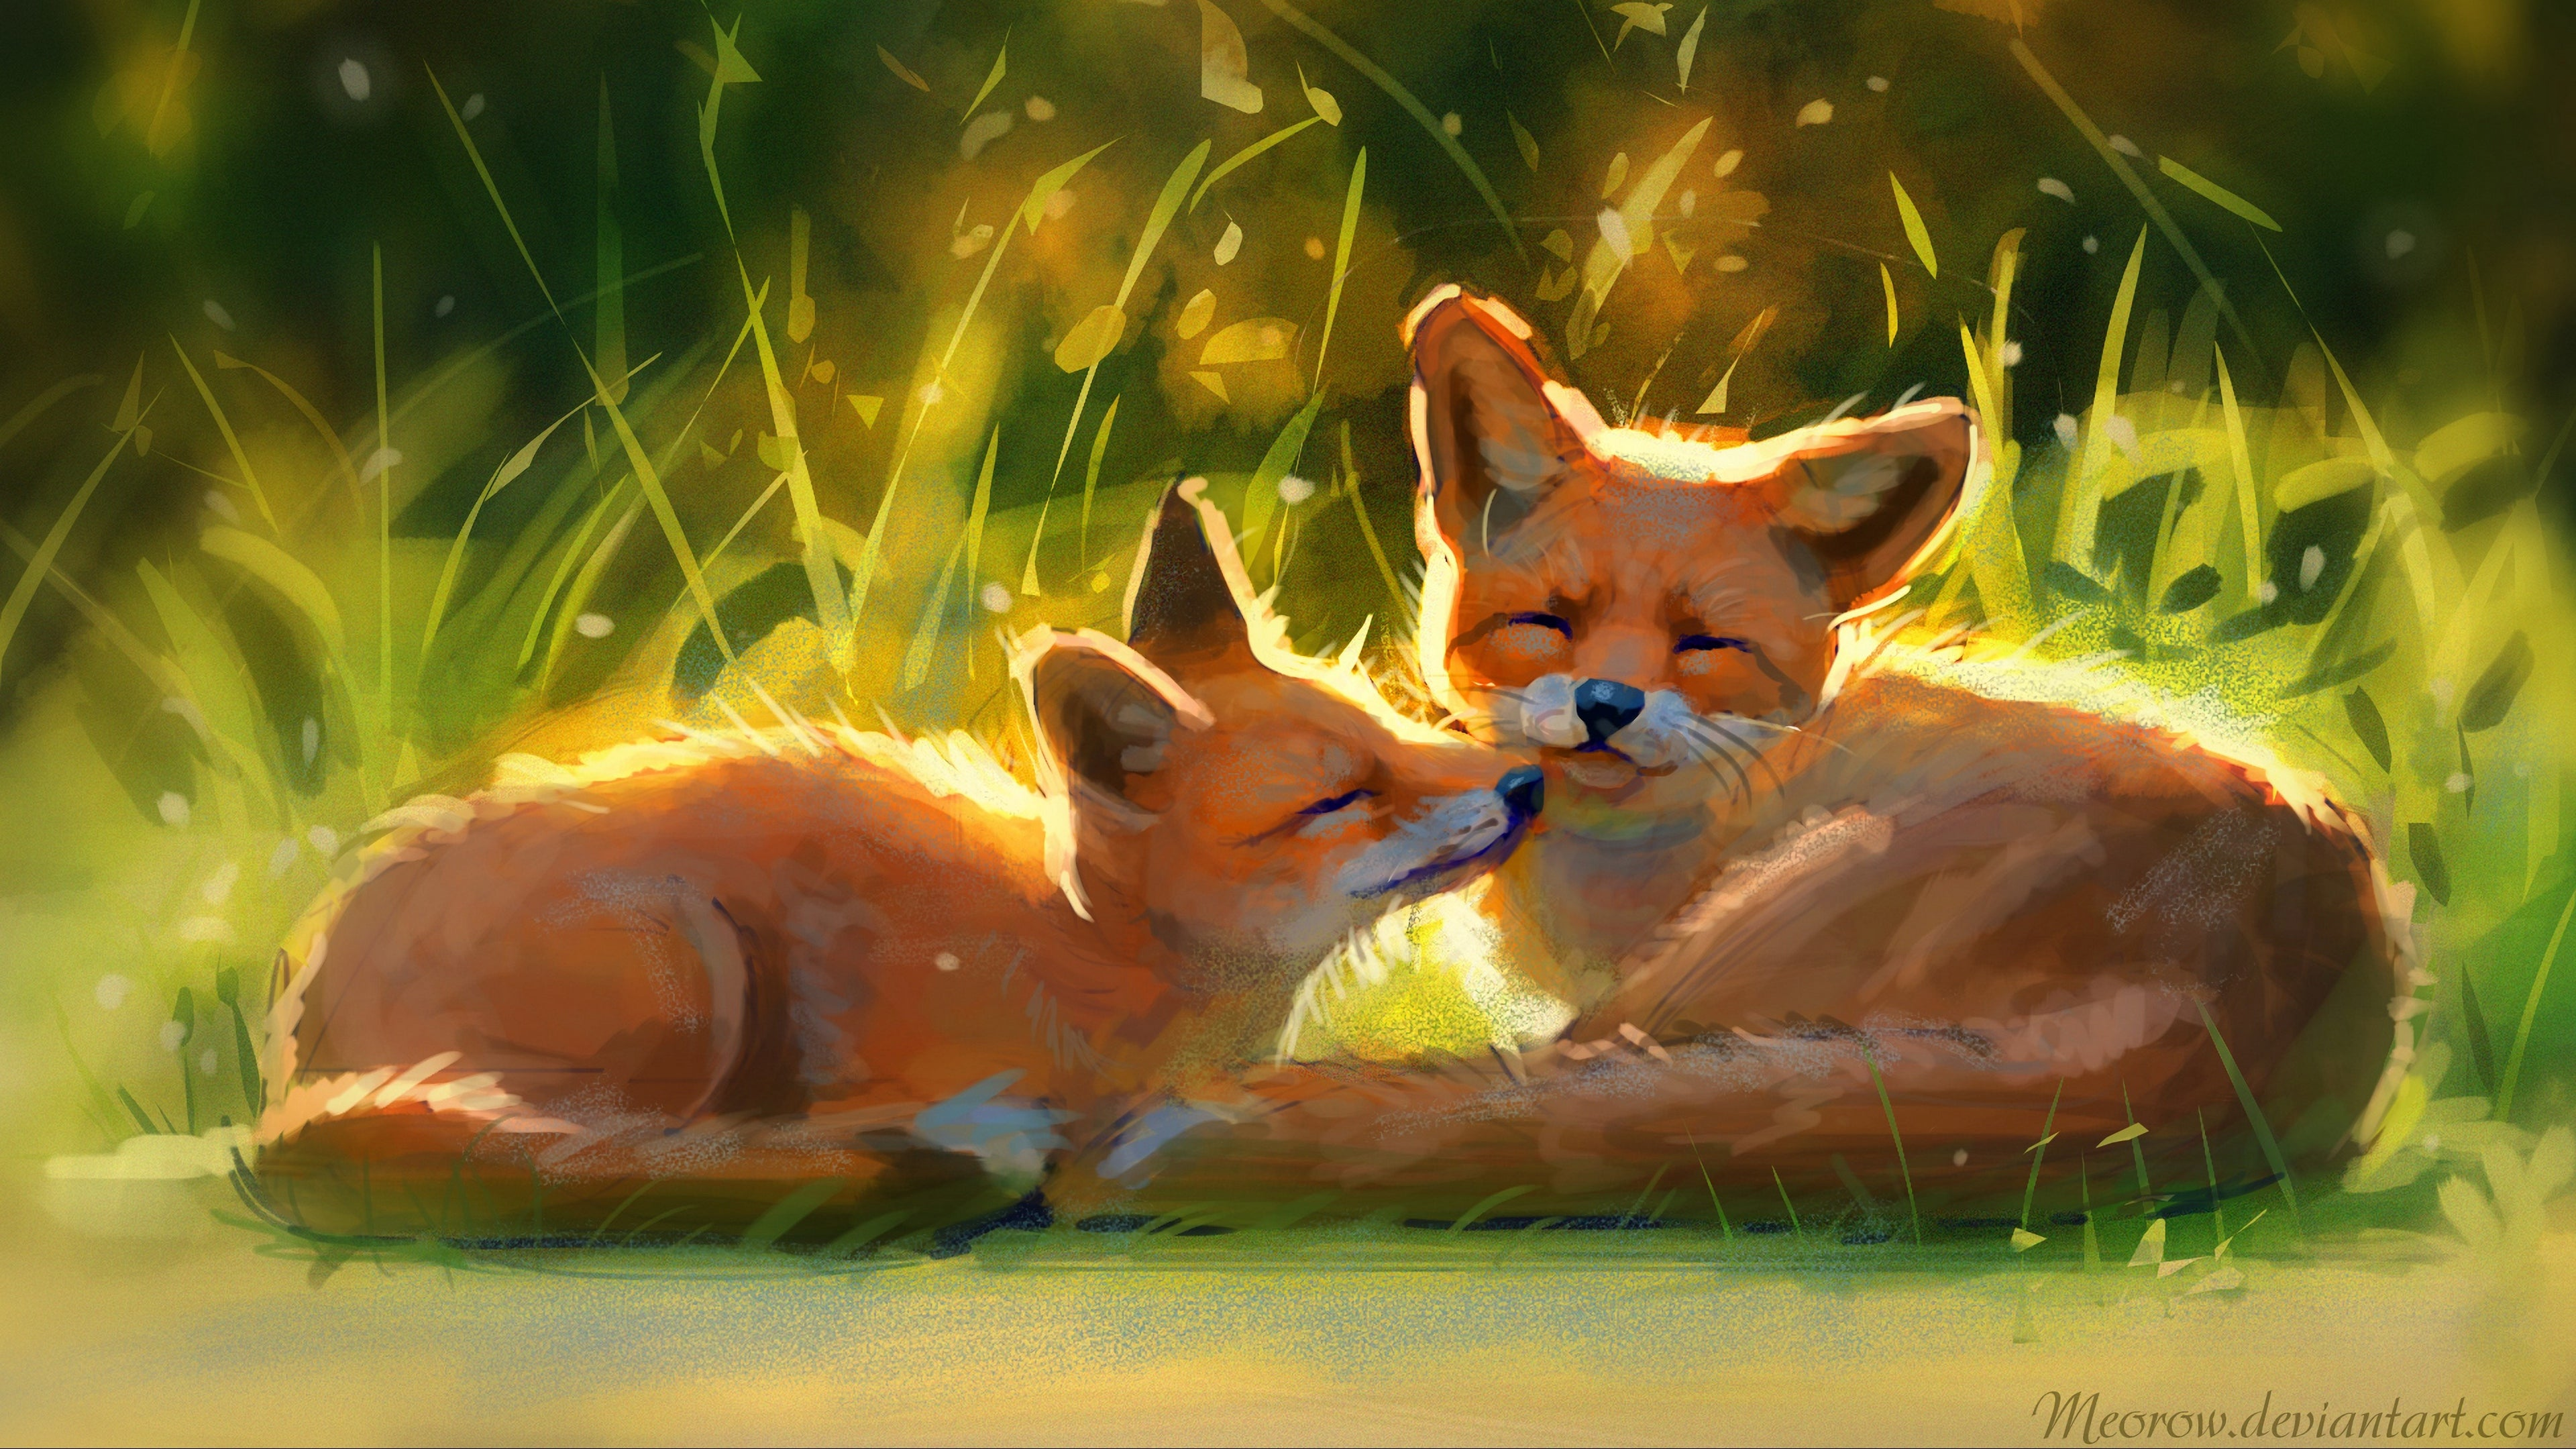 Cute Foxes 4K wallpaper 3840x2160